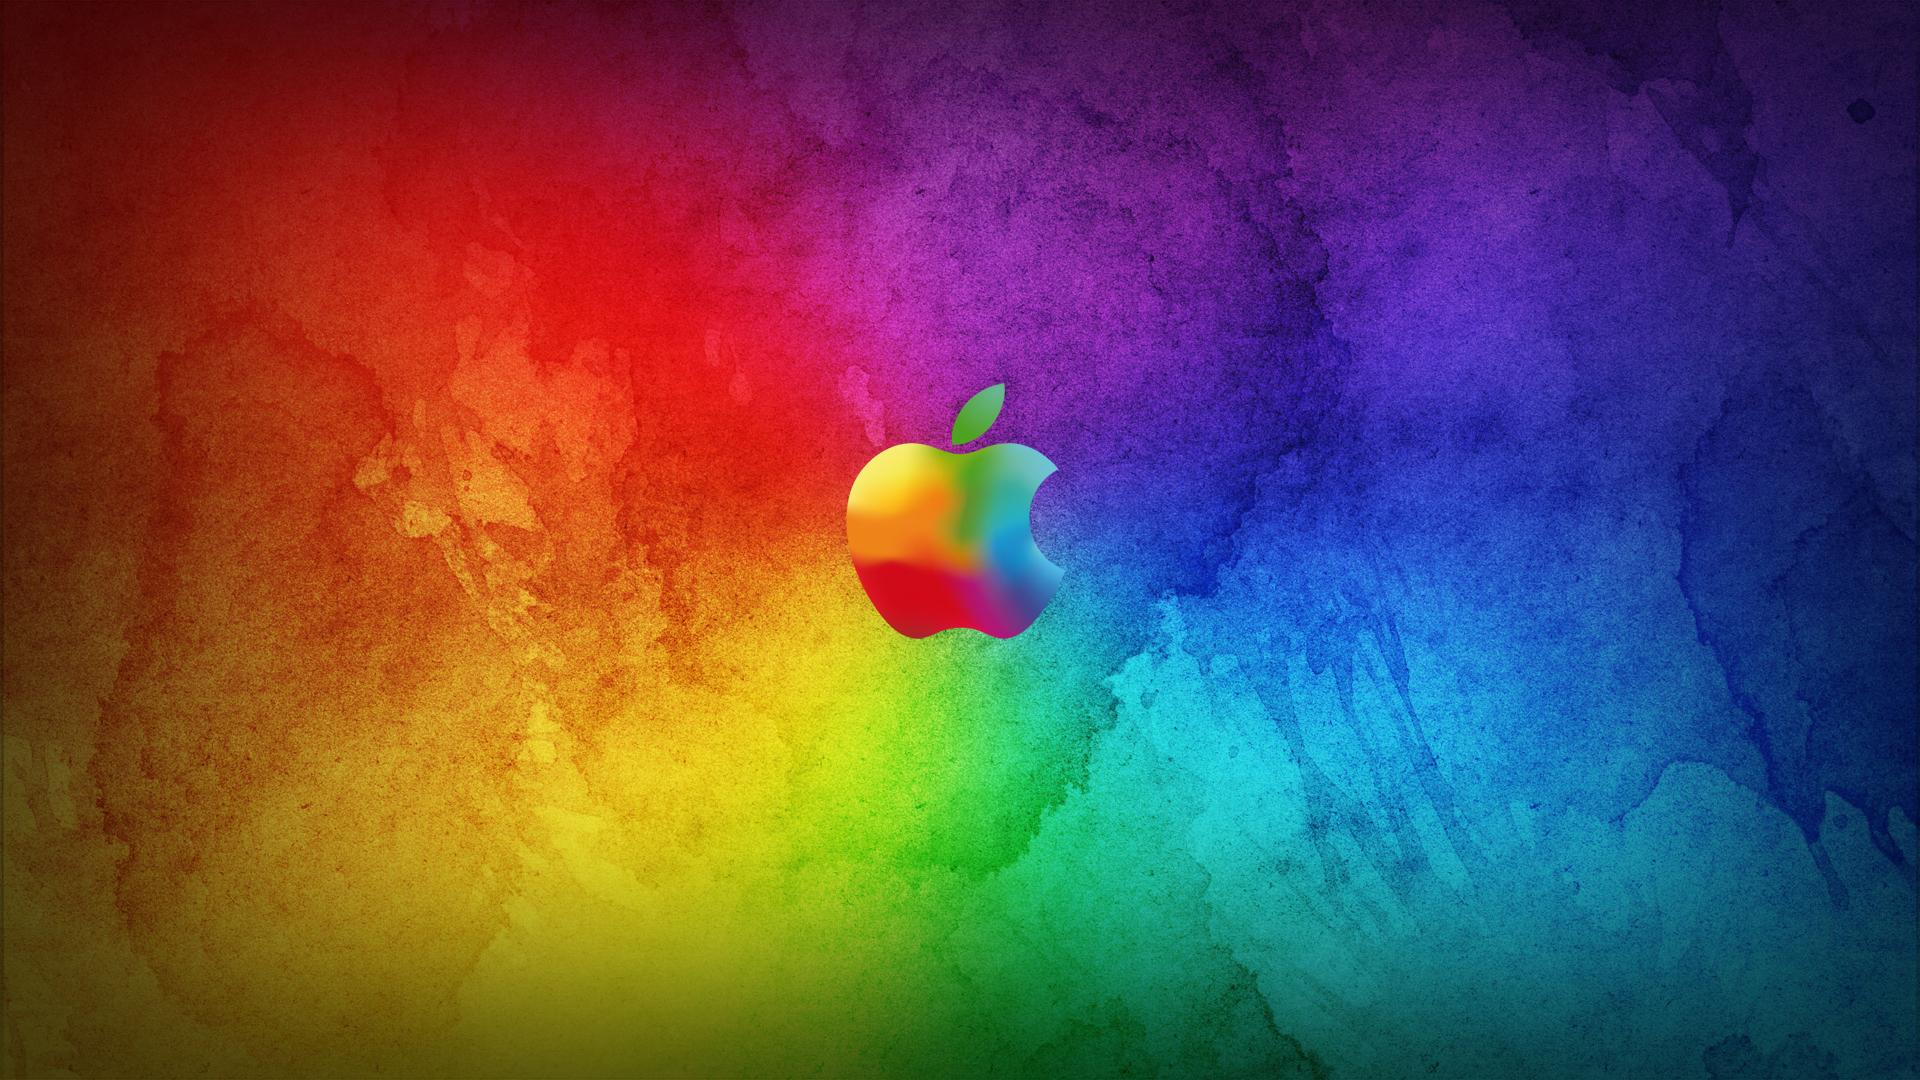 Apple Mac os tech computers logo symbal color wallpaper 1920x1080 1920x1080